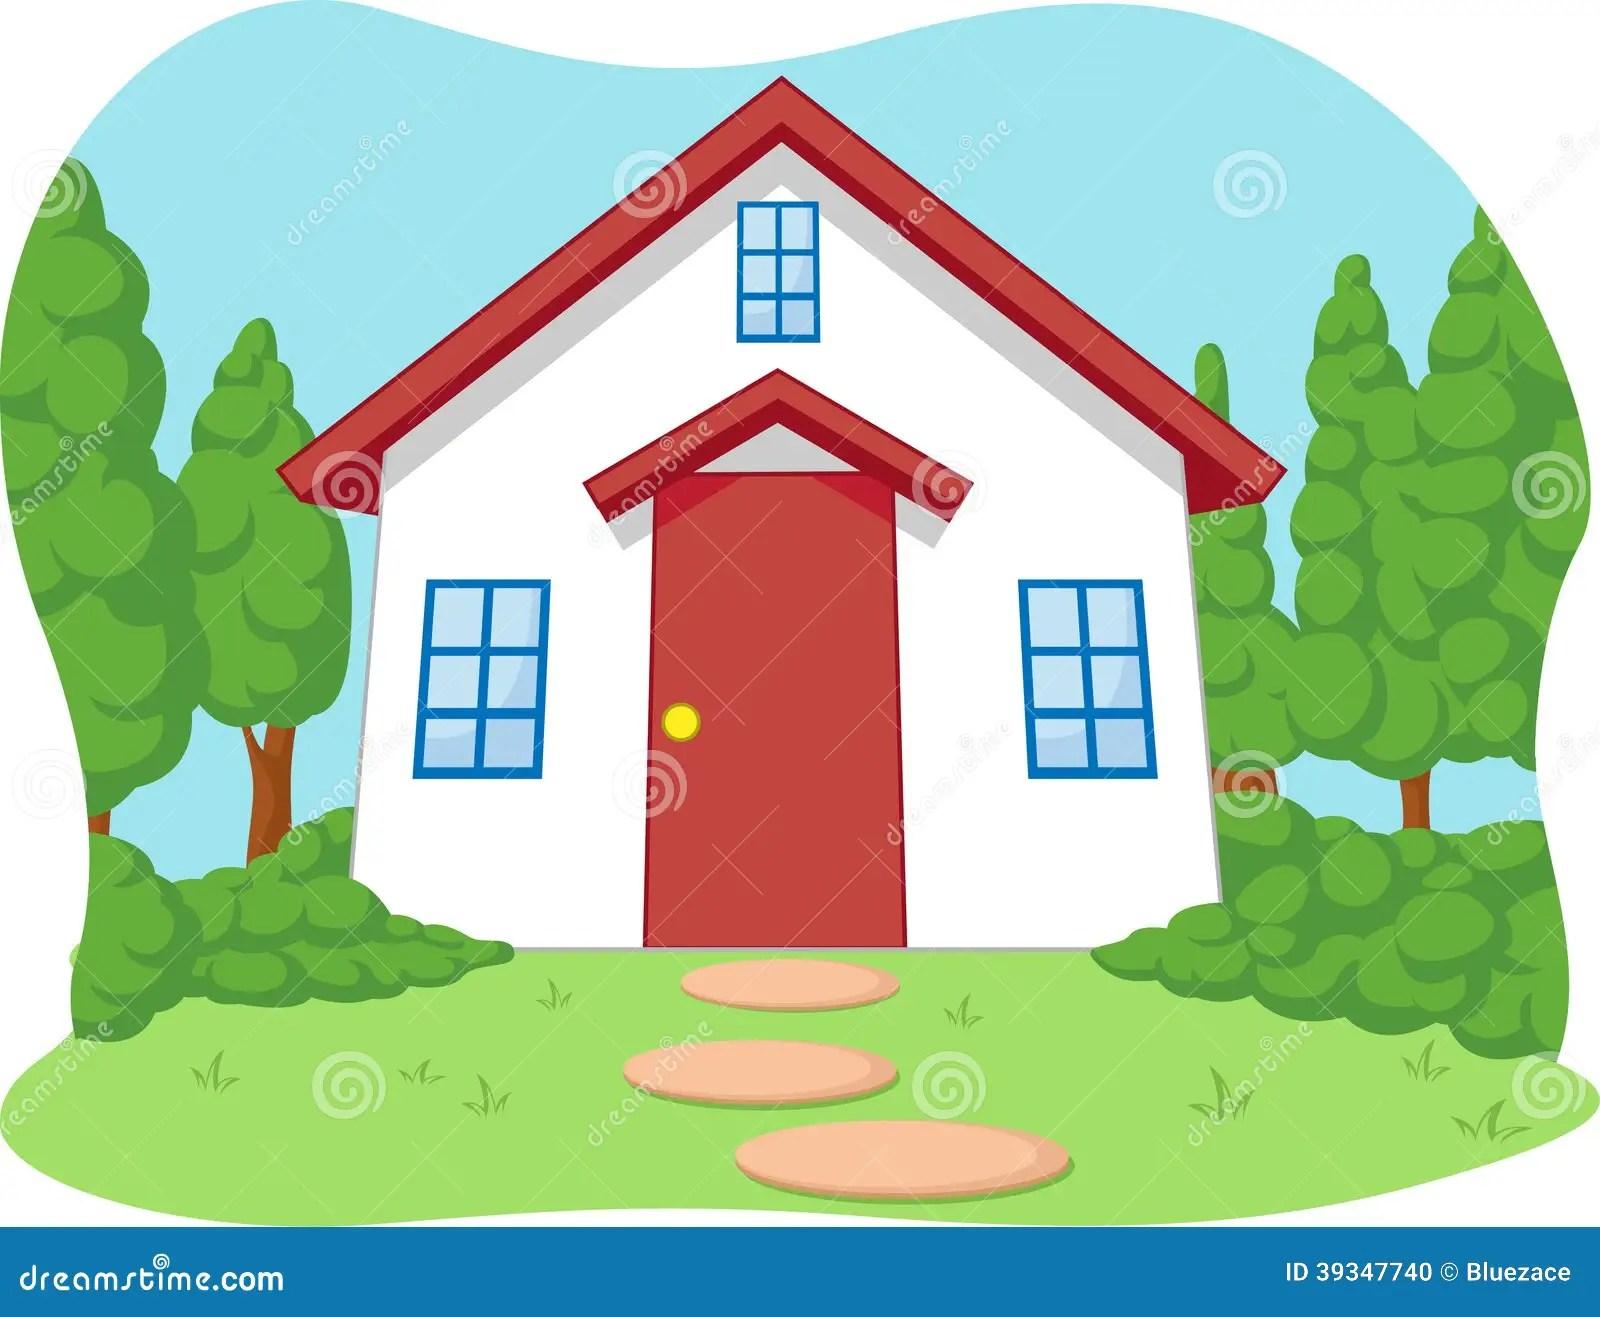 Haus Mit Garten Comic